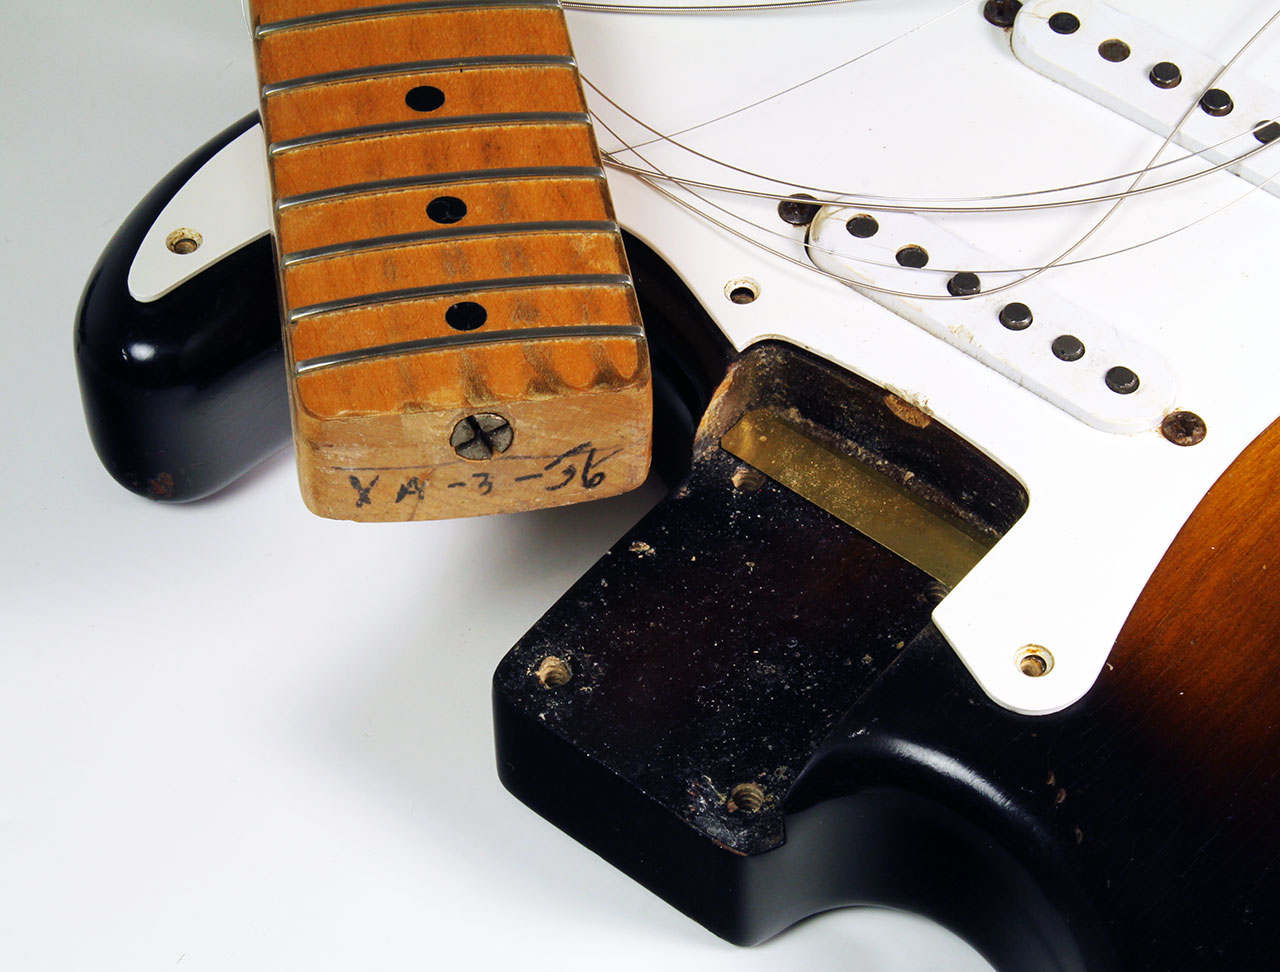 Fender_strat_1956_cons_neck_date_1